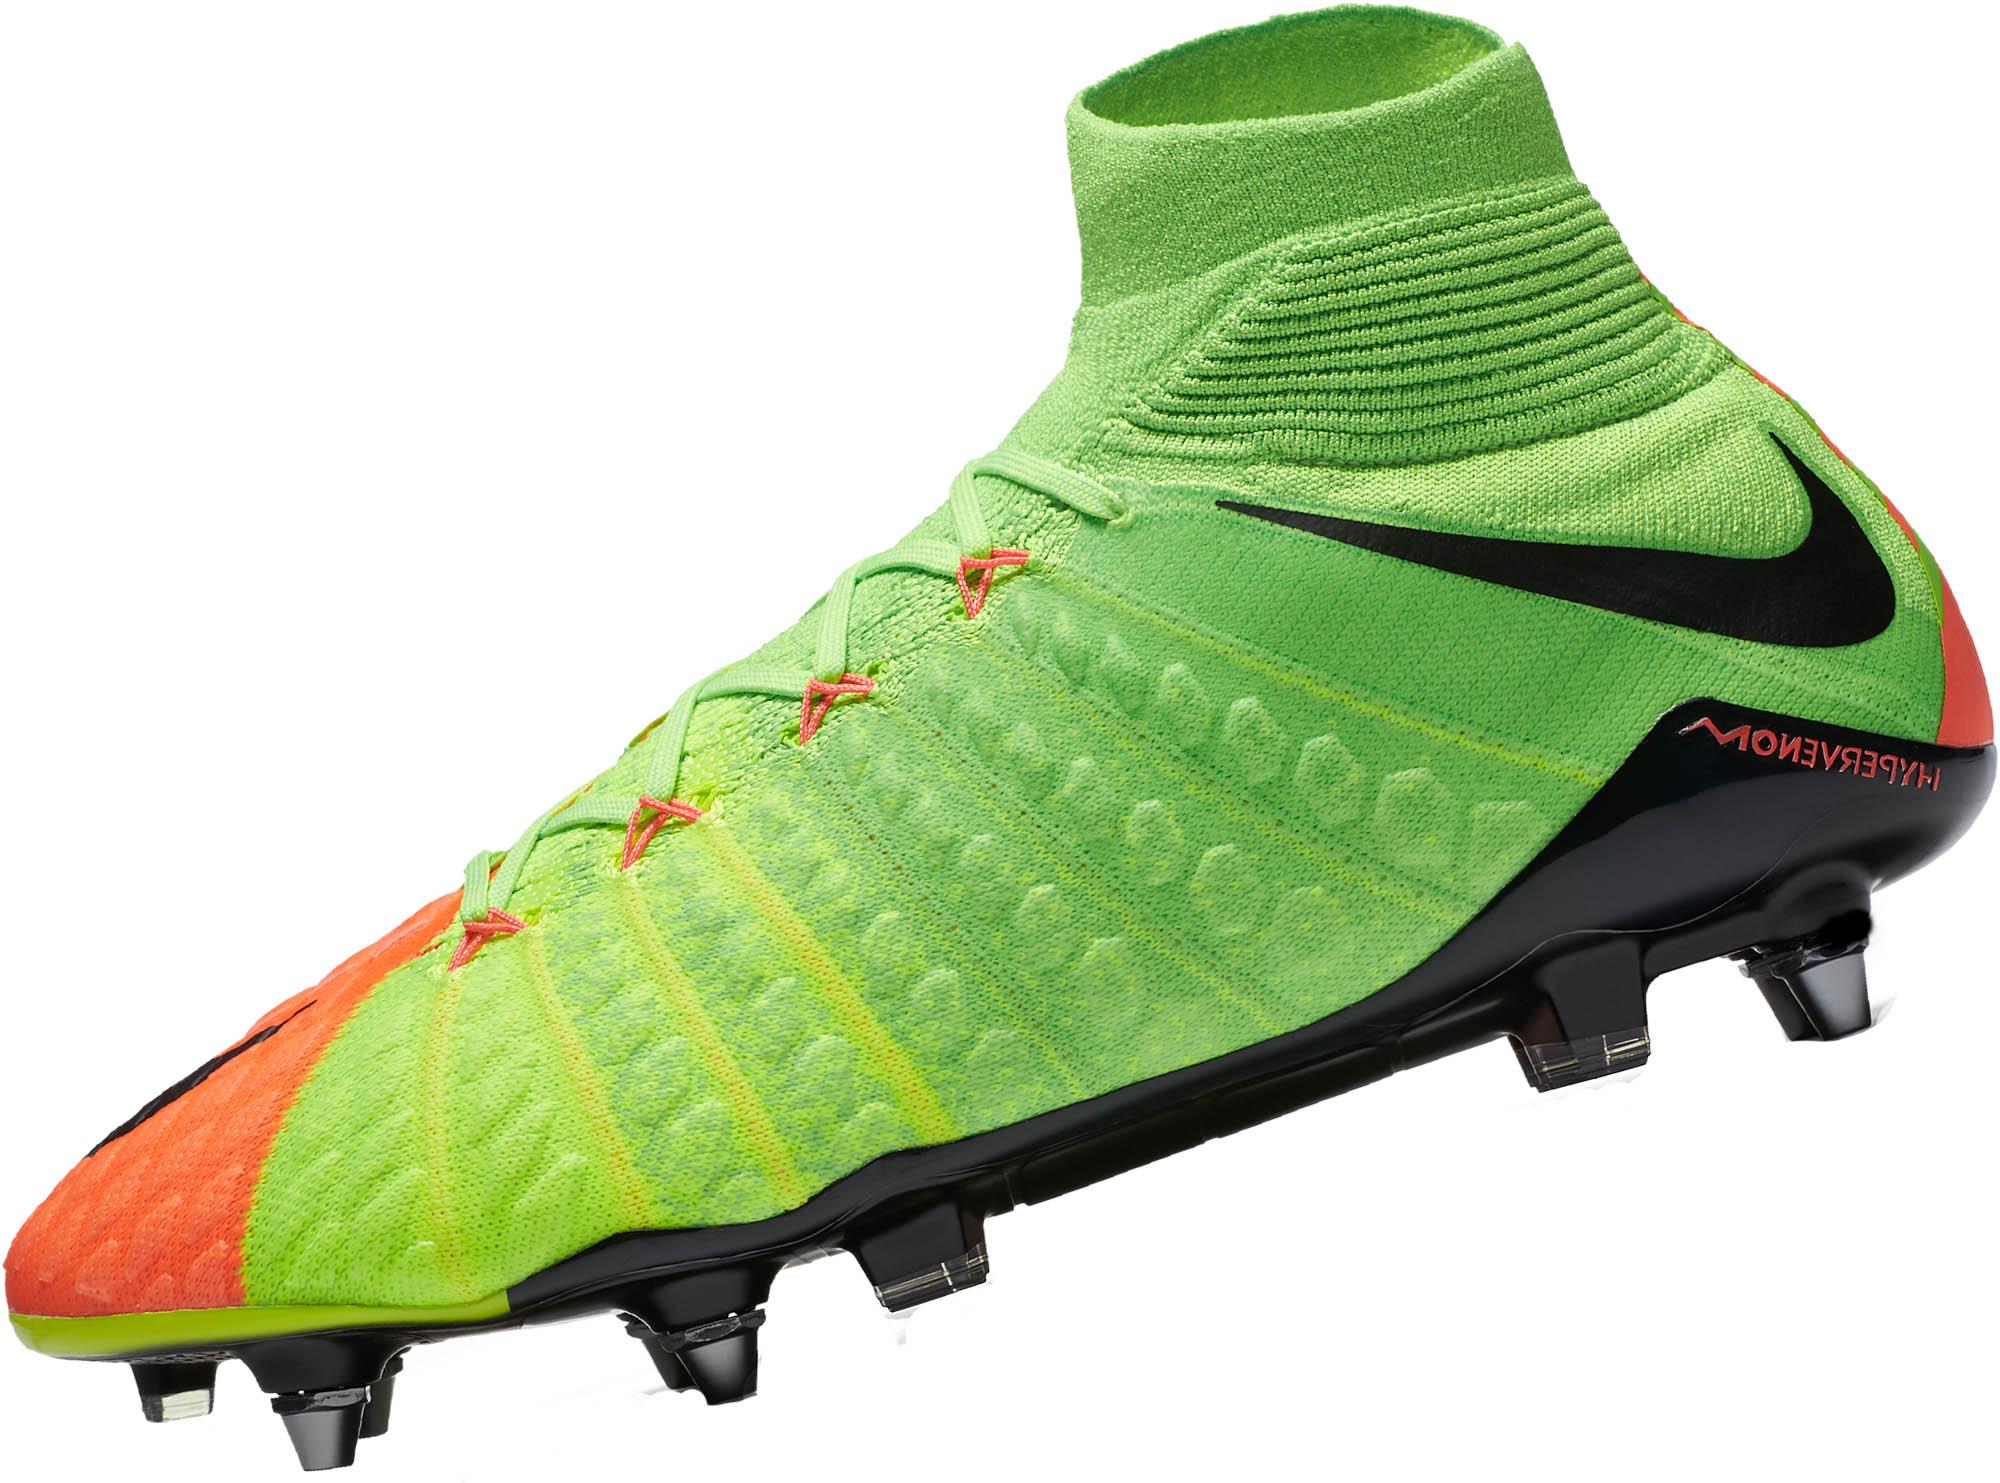 00a76ec1e6f Nike Hypervenom Phantom DF III SG-Pro – Electric Green Hyper Orange